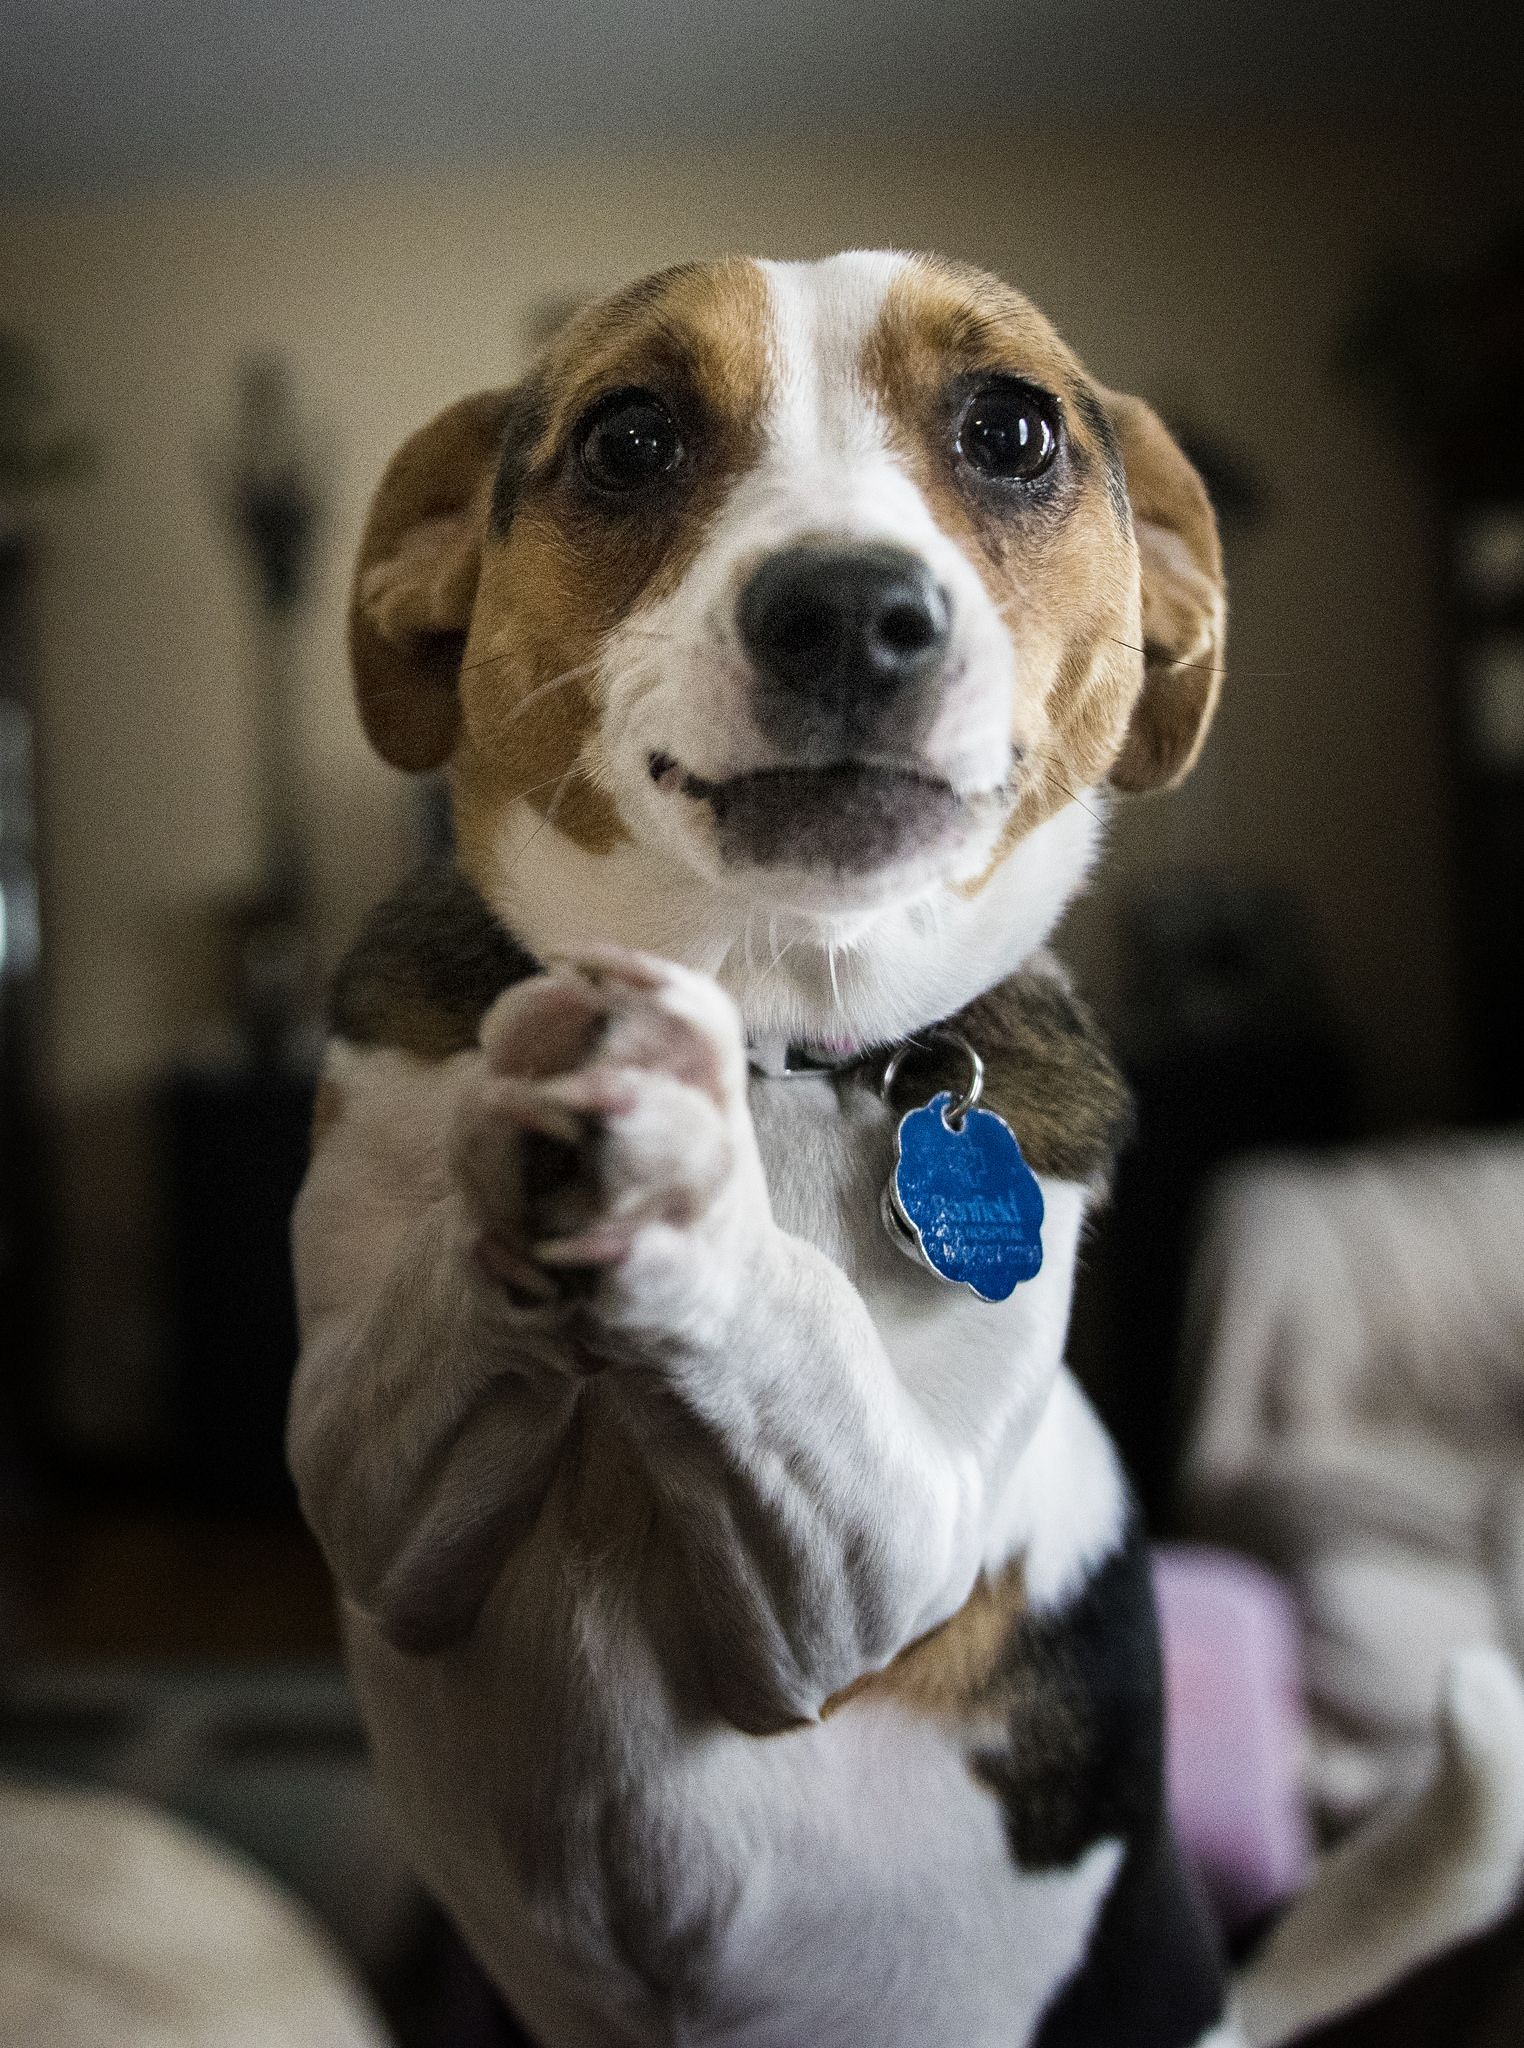 PLEEEEEEASE! Dogs, Animals